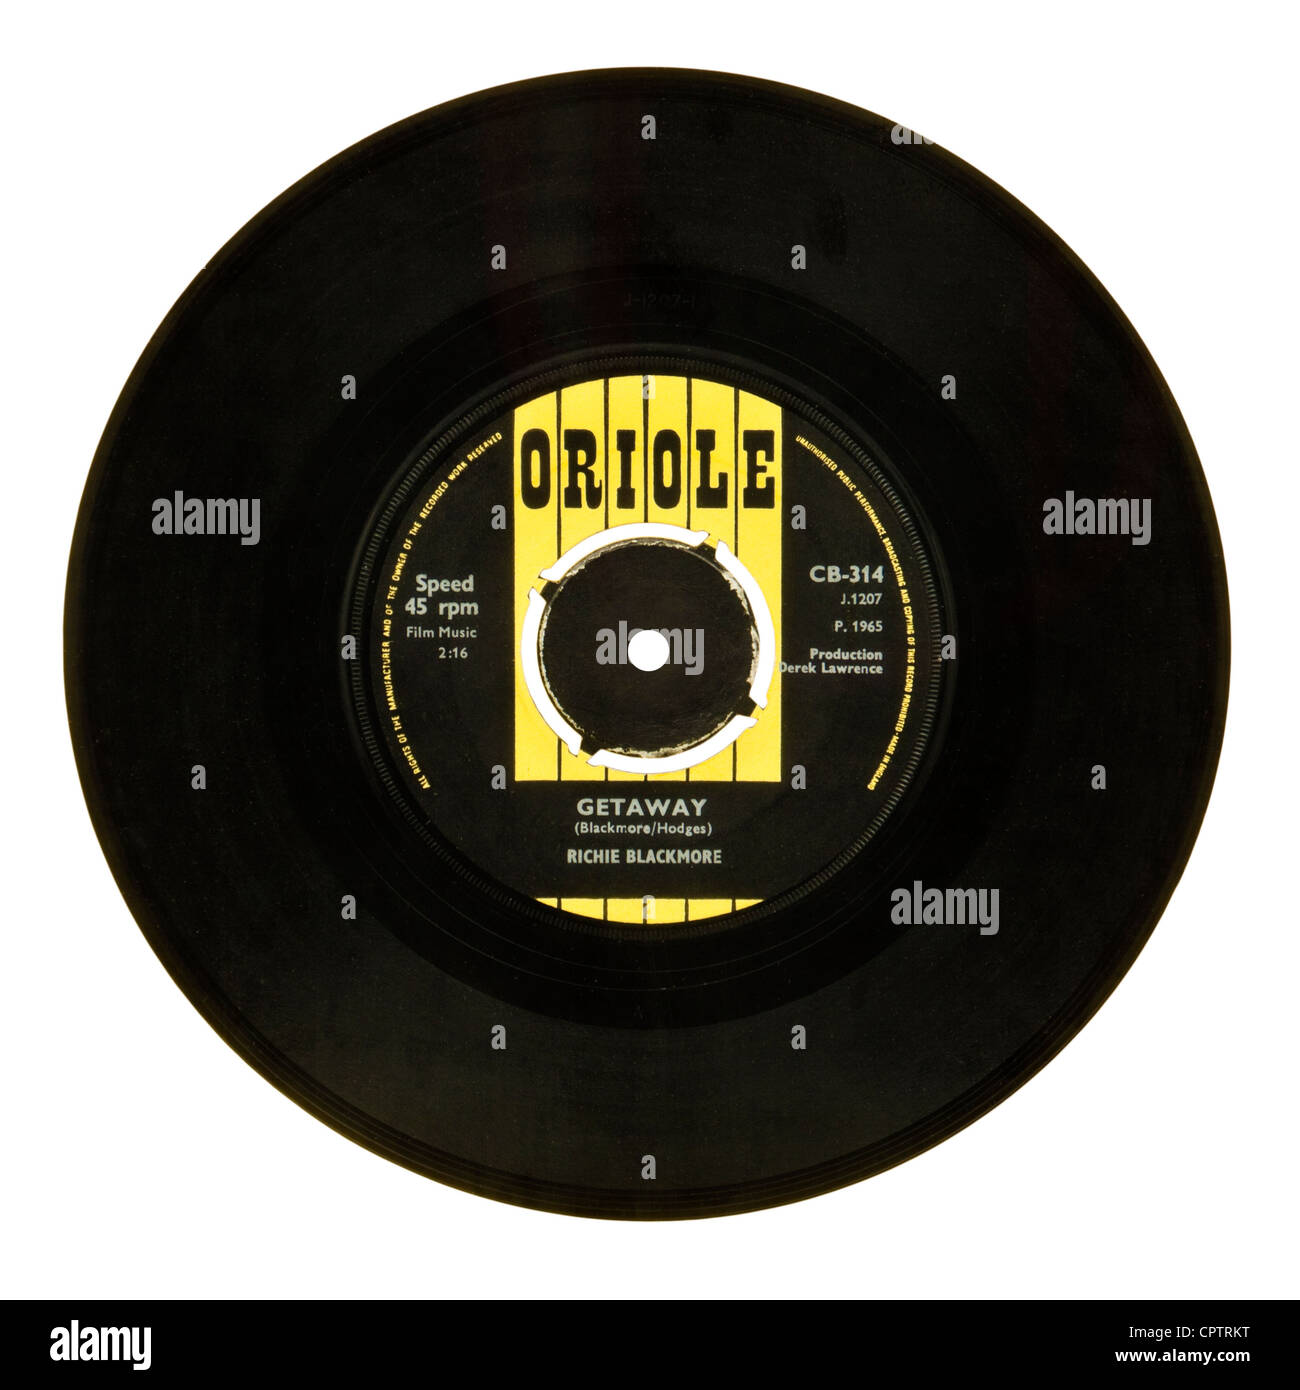 Mega rare 1965 Richie Blackmore (pre-Deep Purple) 7' UK single 'Getaway / Little Brown Jug' (Oriole - Stock Image